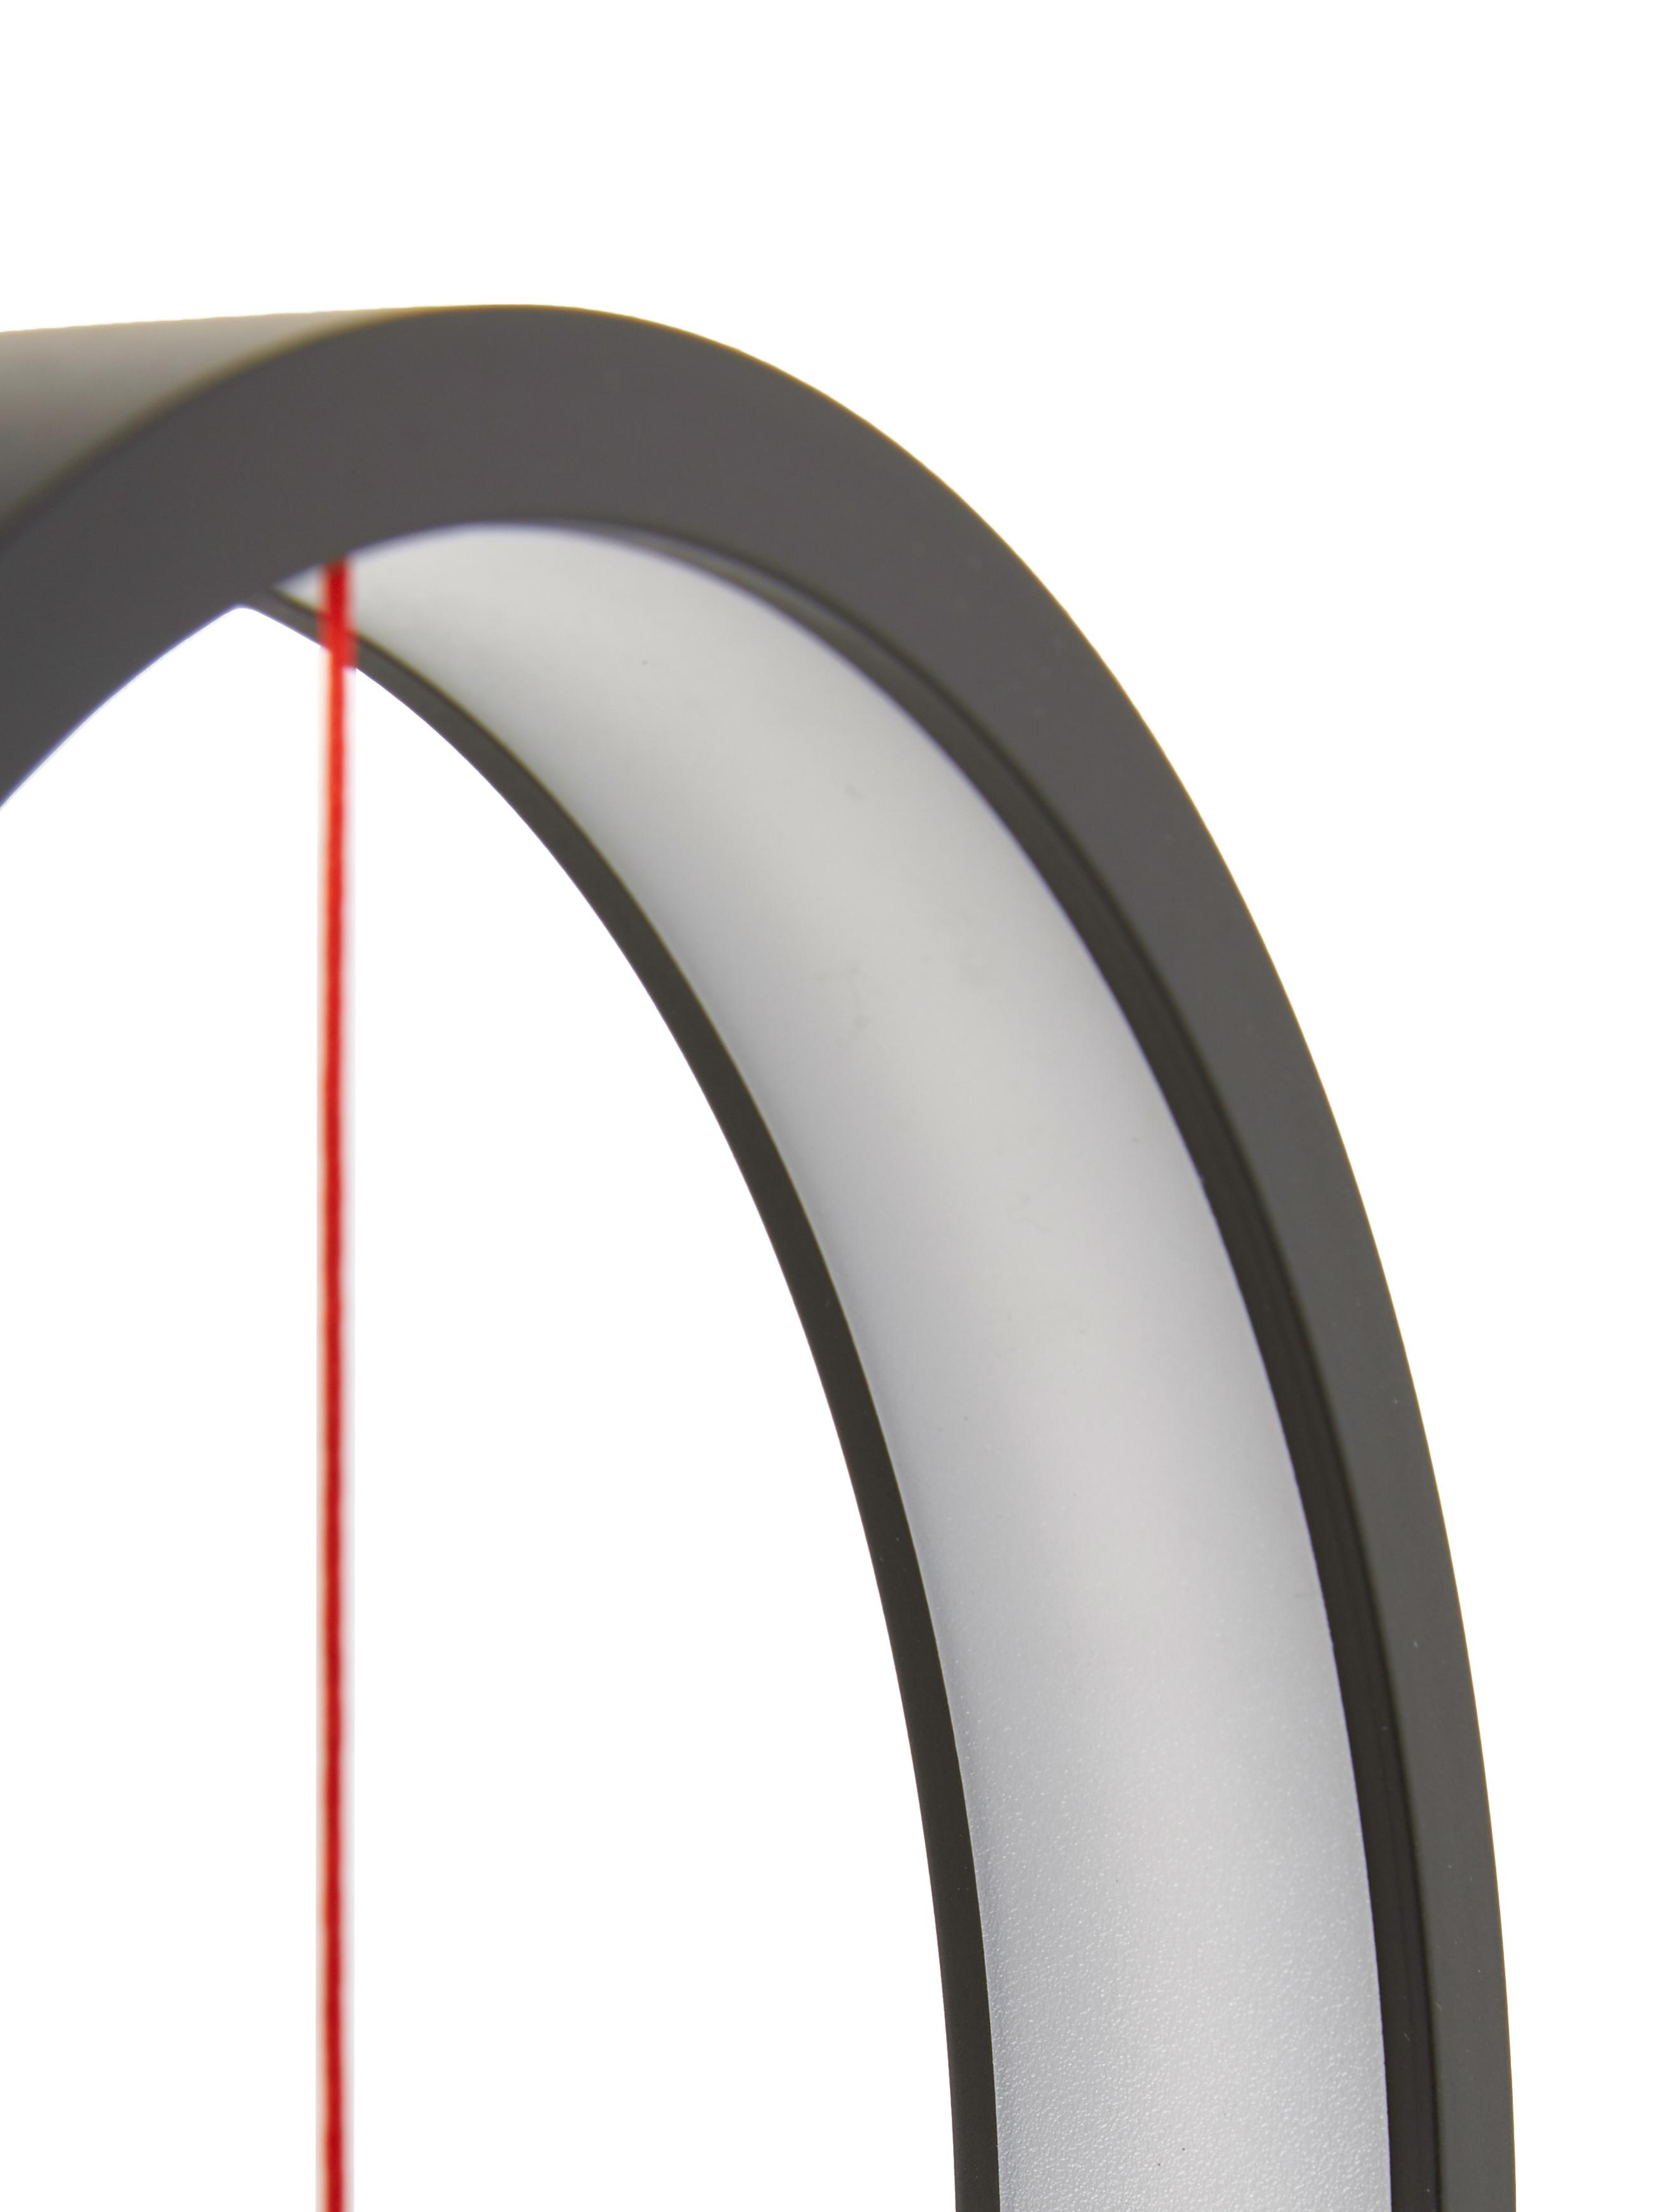 Moderne LED Tischlampe Heng, Weiß, 20 x 40 cm